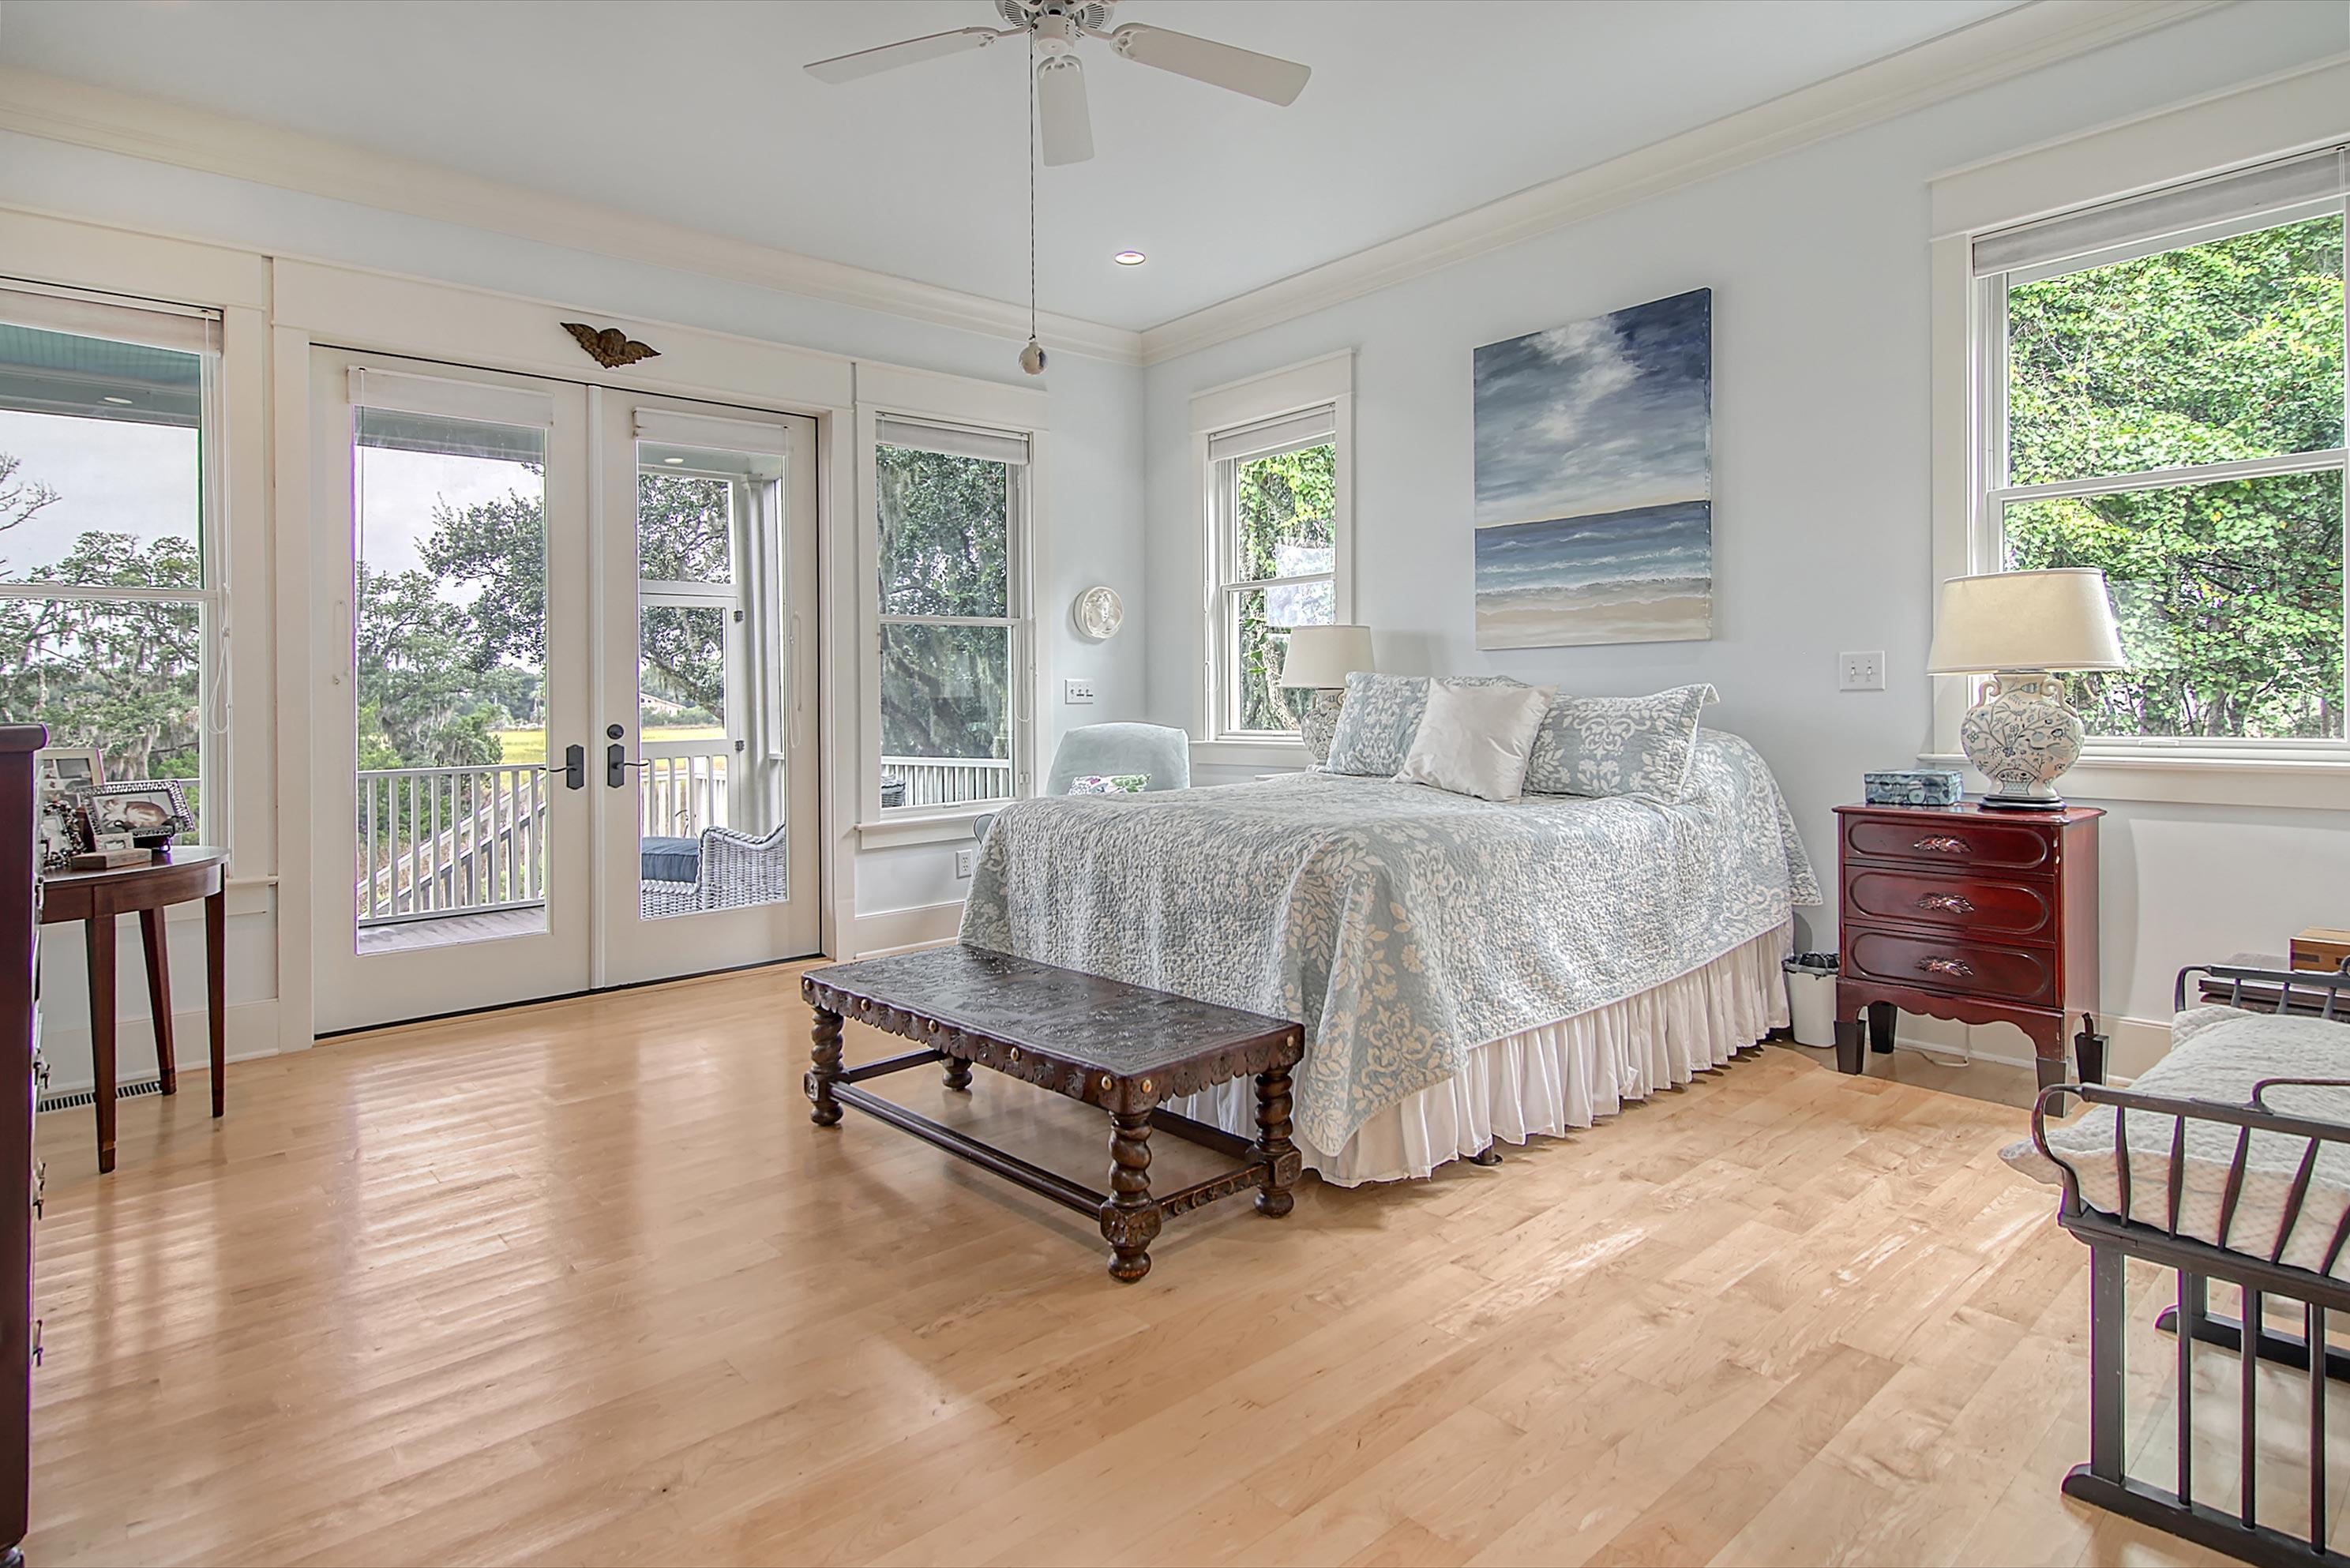 Scanlonville Homes For Sale - 152 6th, Mount Pleasant, SC - 29